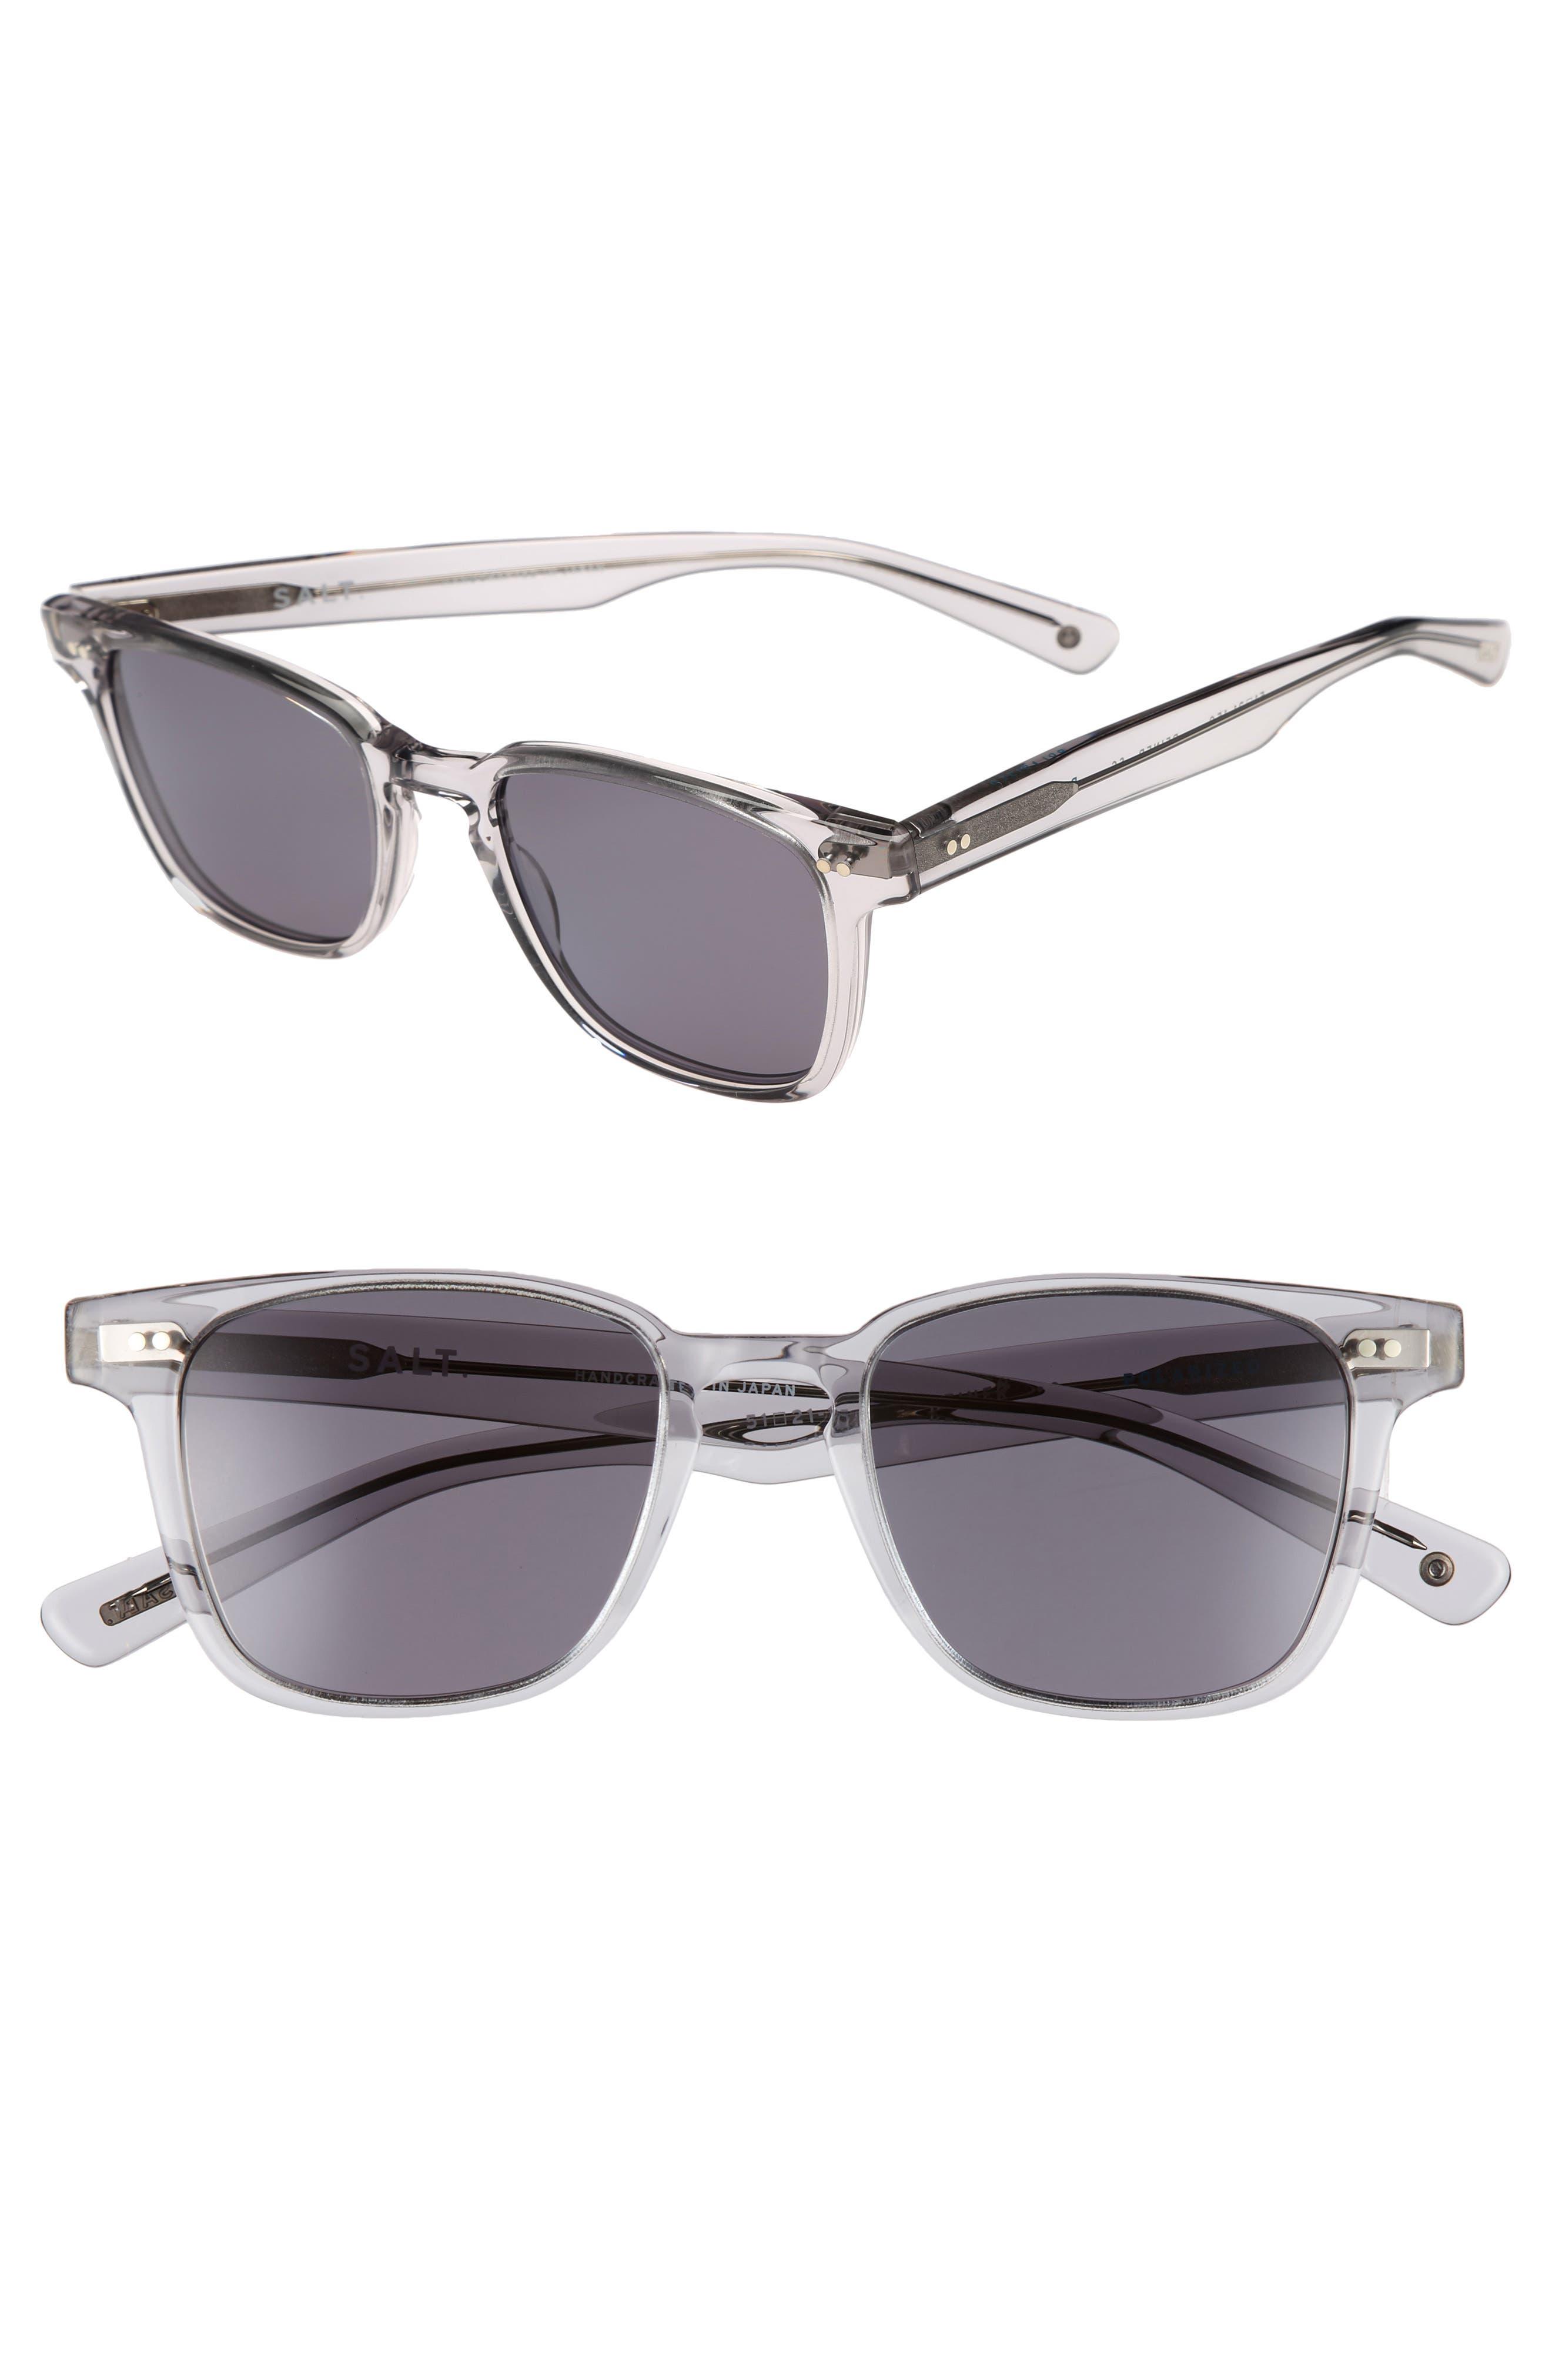 Alternate Image 1 Selected - SALT Reiner 51mm Polarized Sunglasses